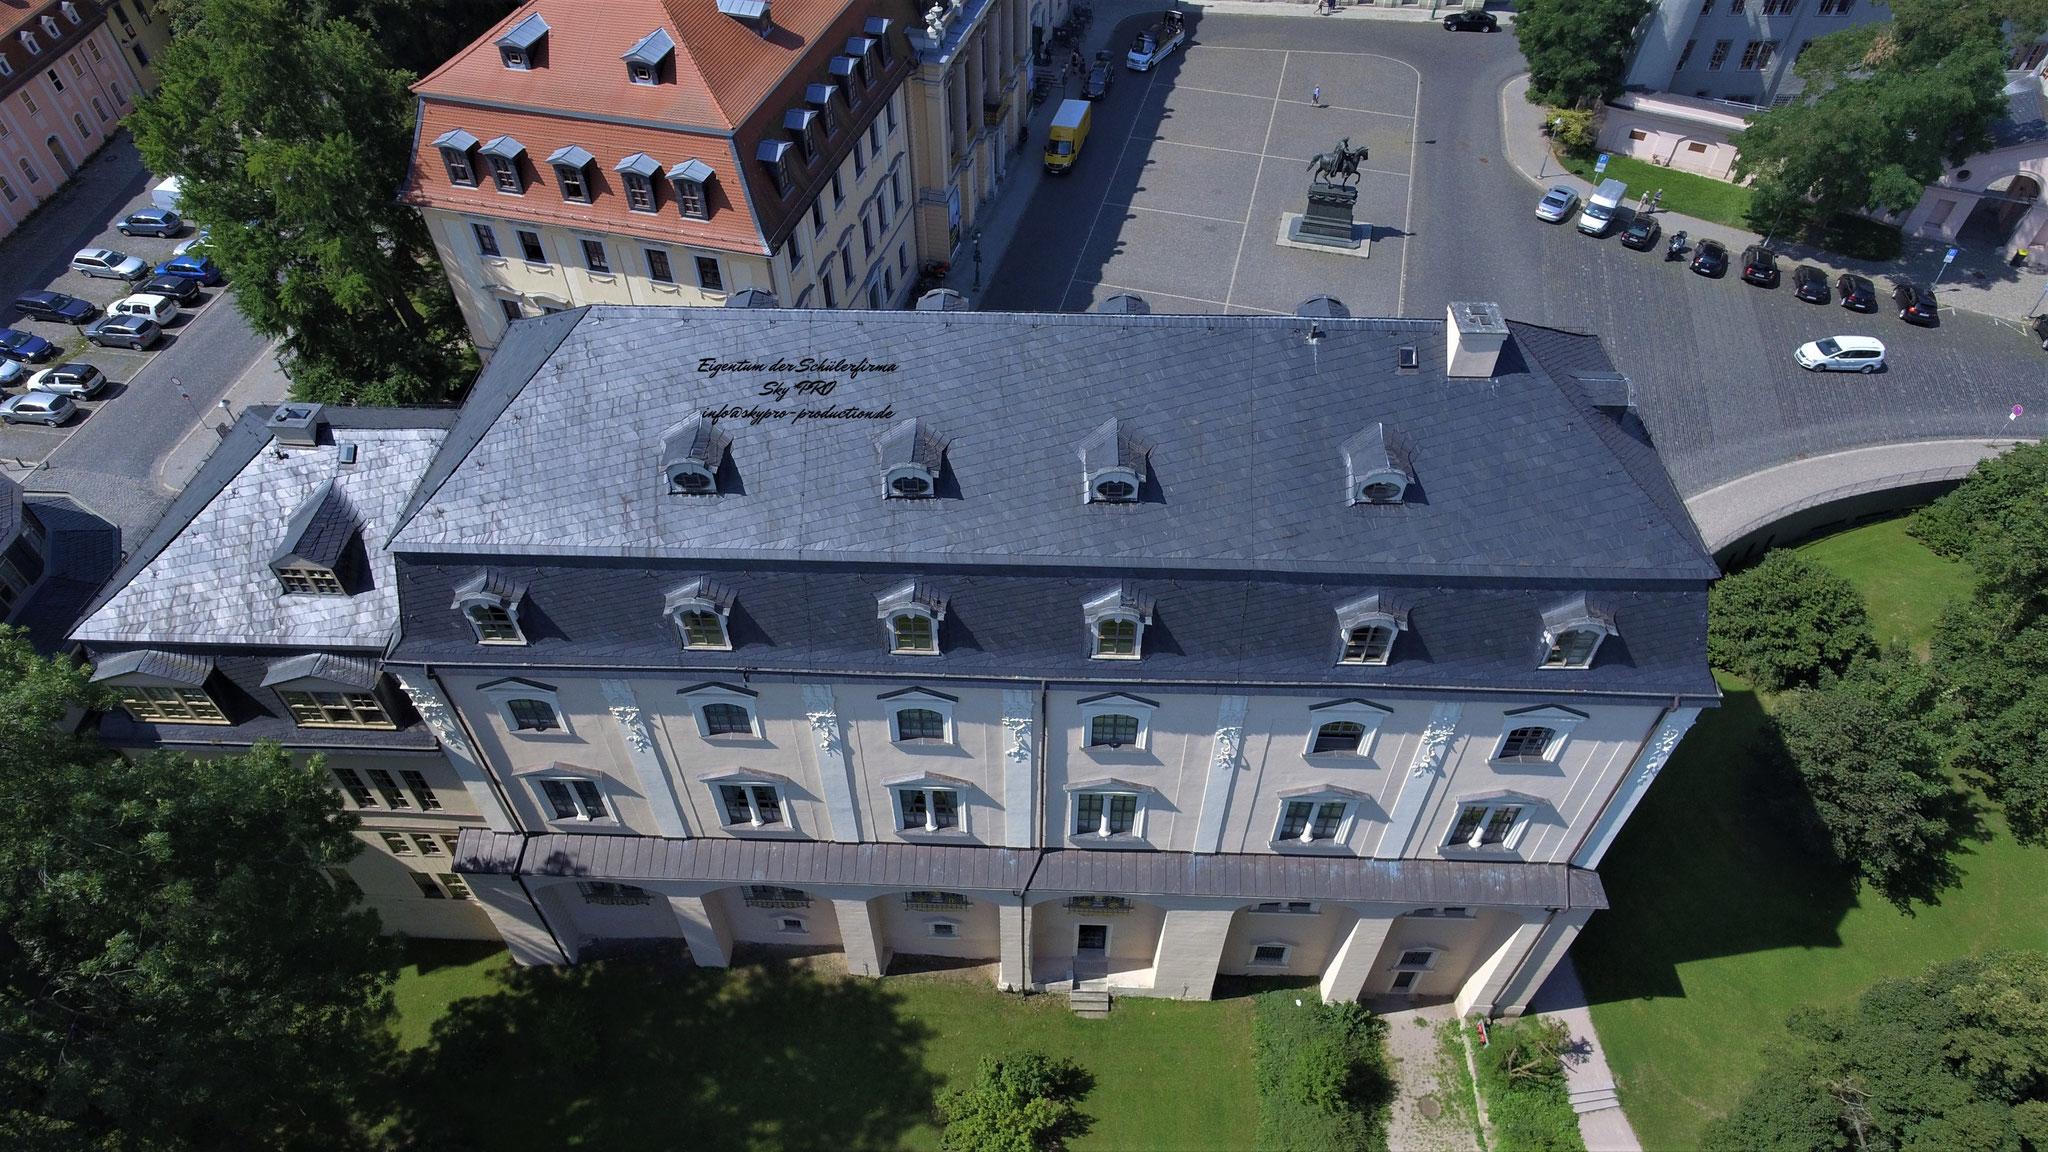 Anna-Amalia-Bibliothek Weimar